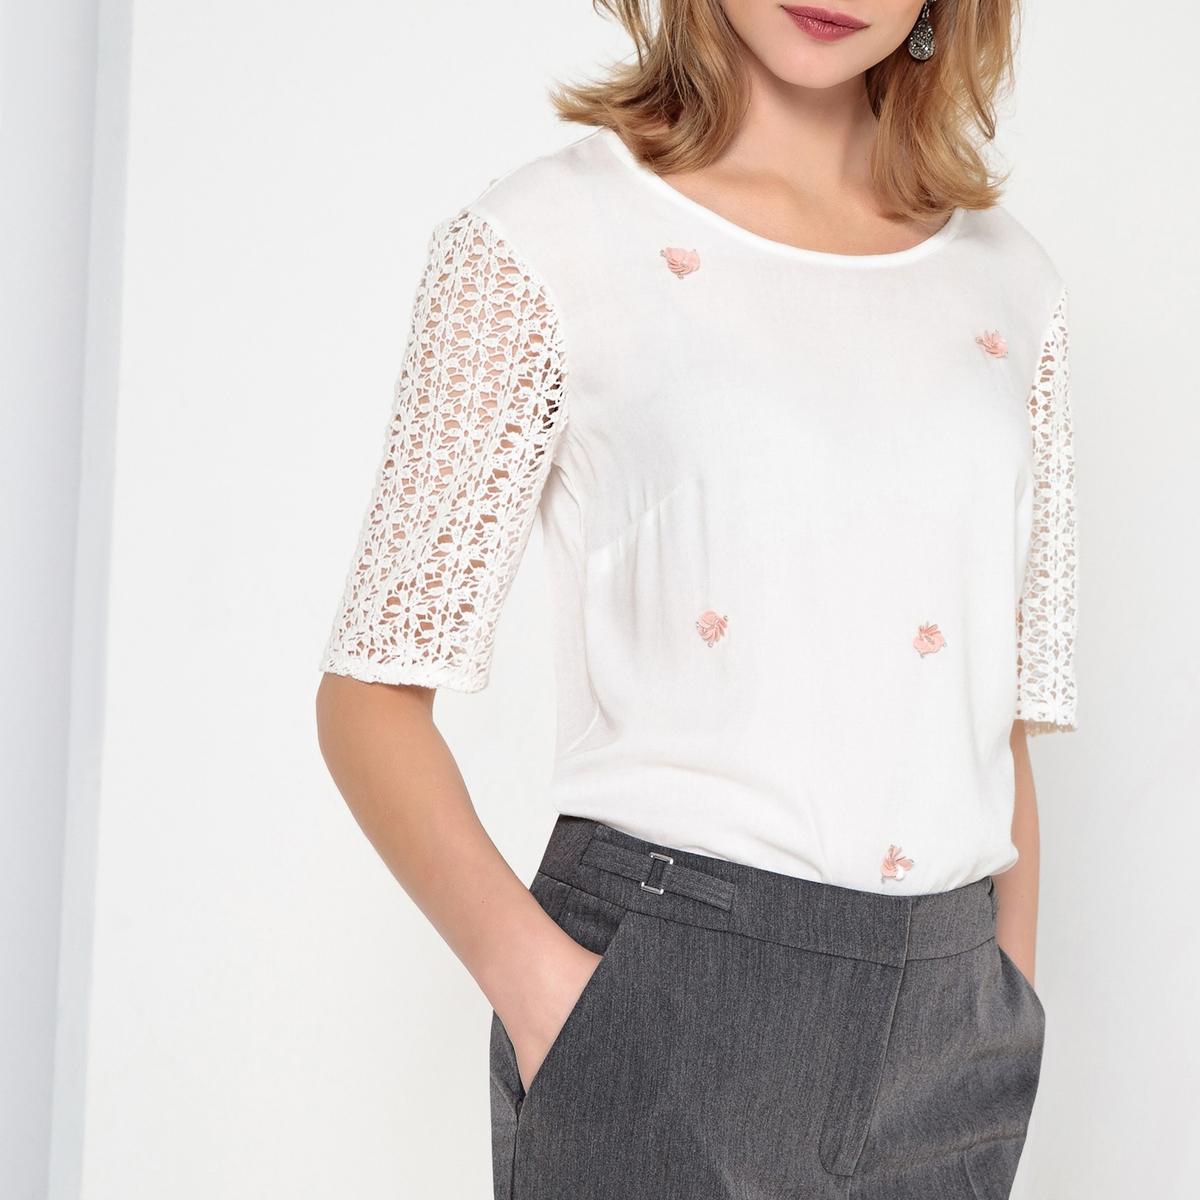 Imagen secundaria de producto de Camiseta fantasía de punto vaporoso - Anne weyburn